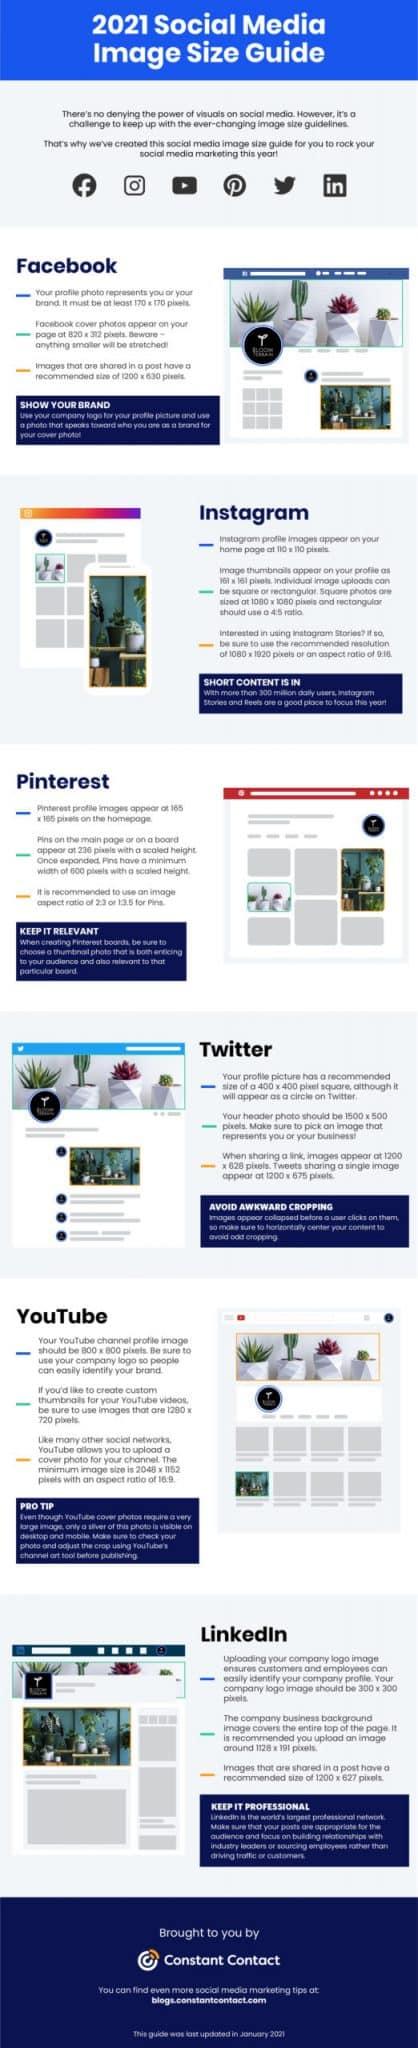 2021-social-media-image-size-guide